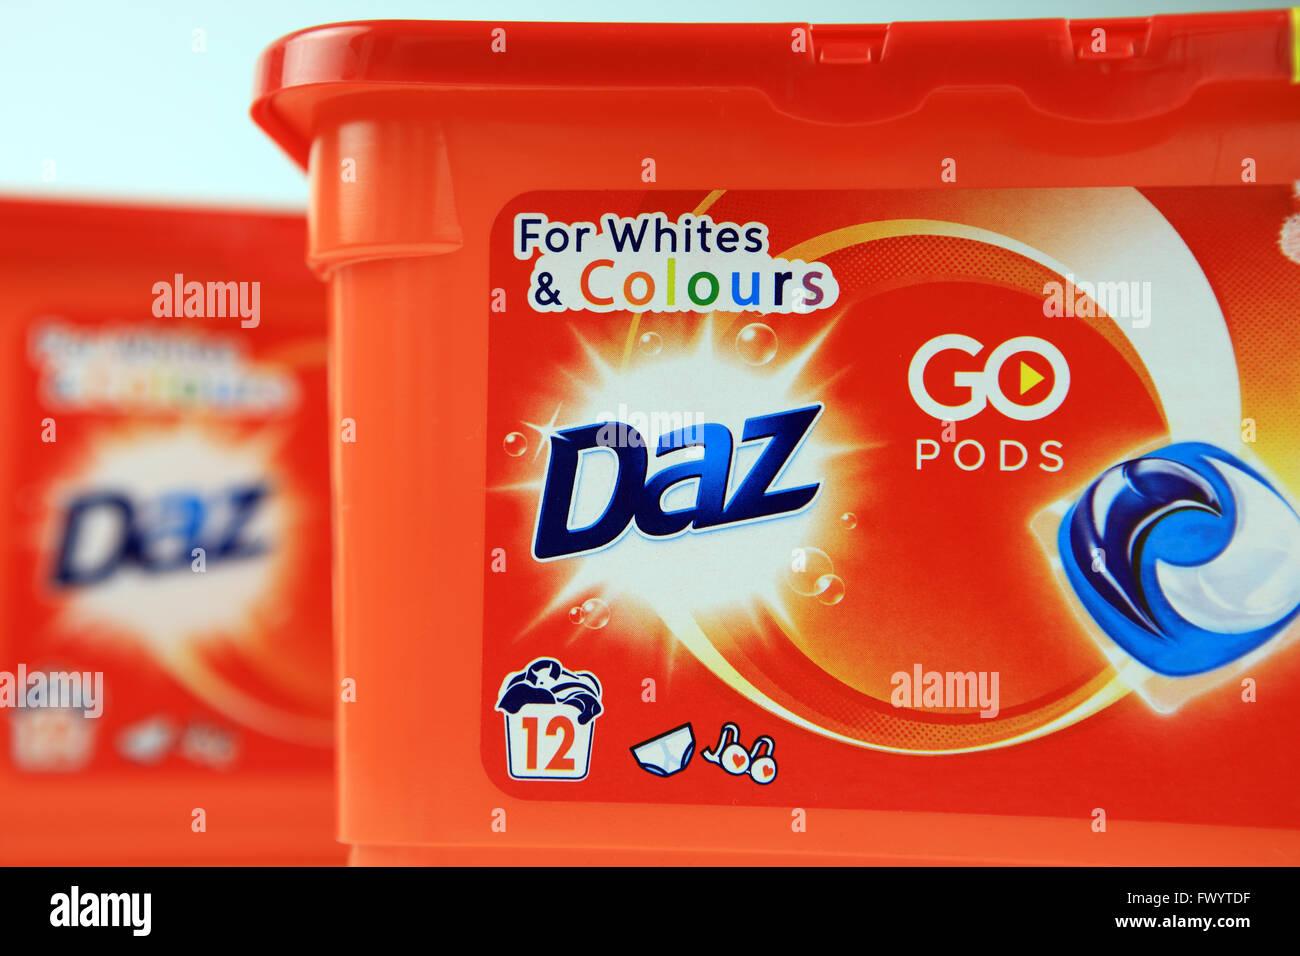 Daz laundry detergent pods - Stock Image